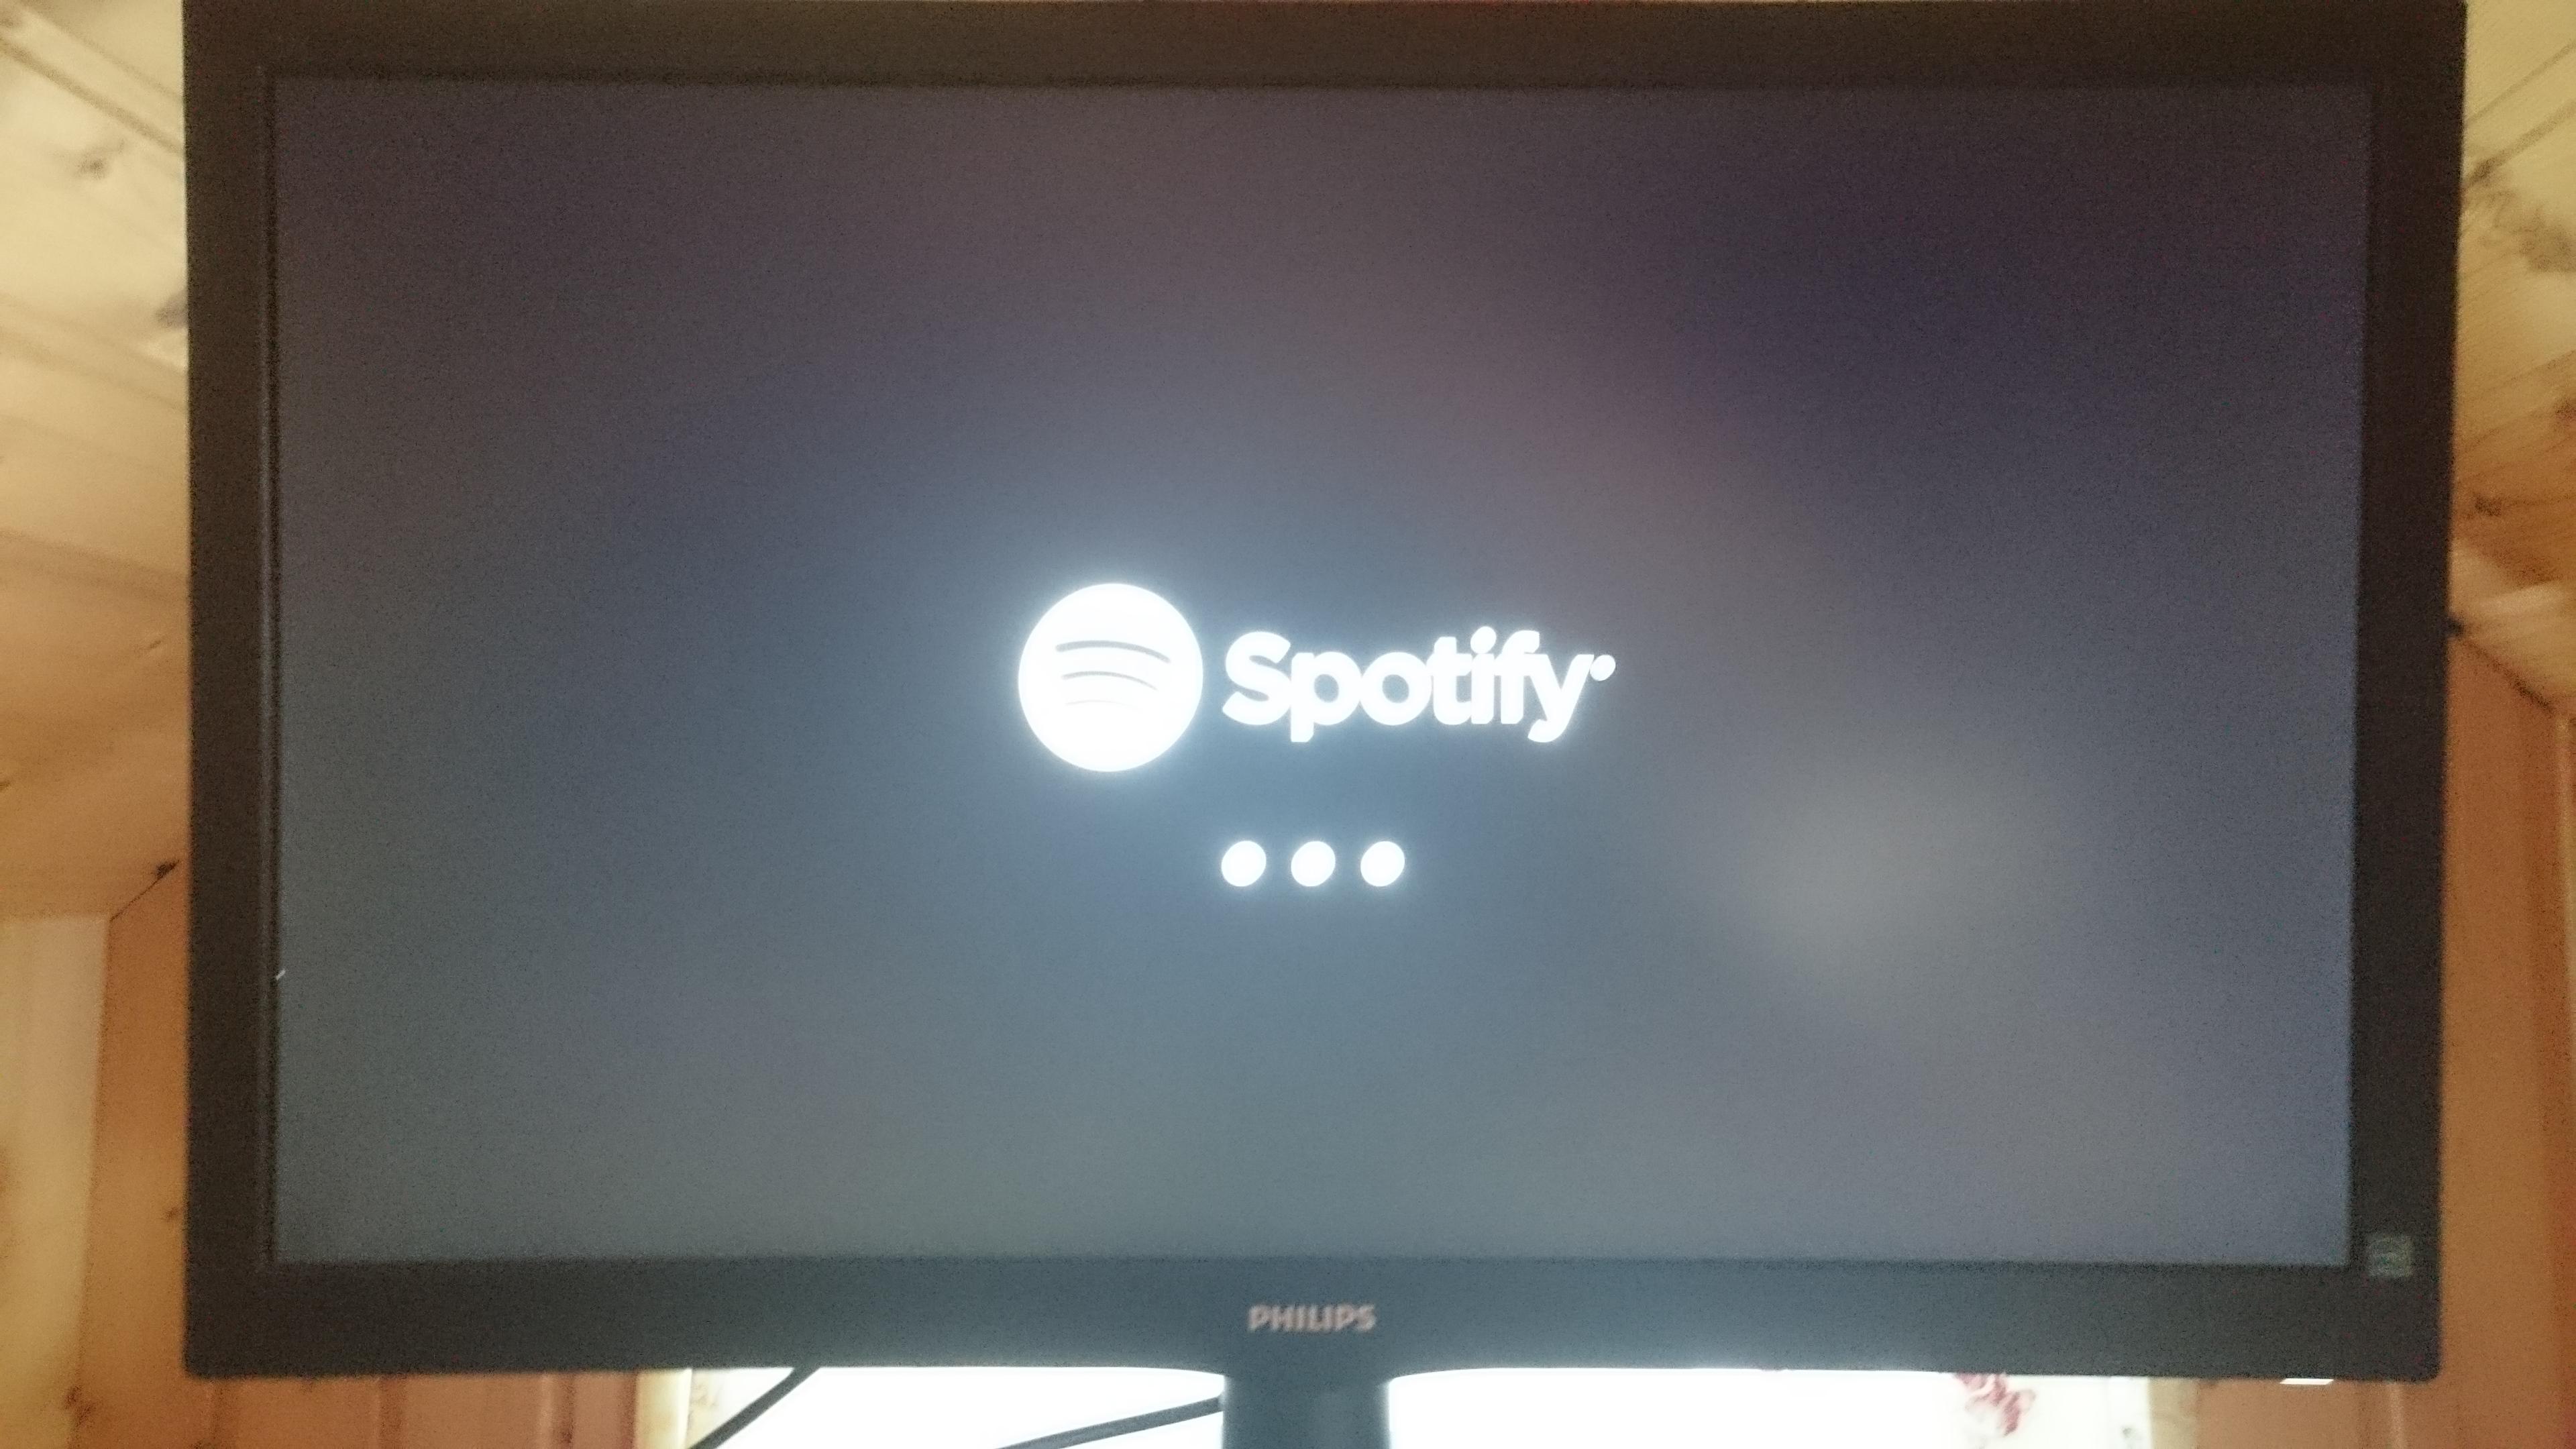 Ps4  Spotify stuck on loading screen - The Spotify Community